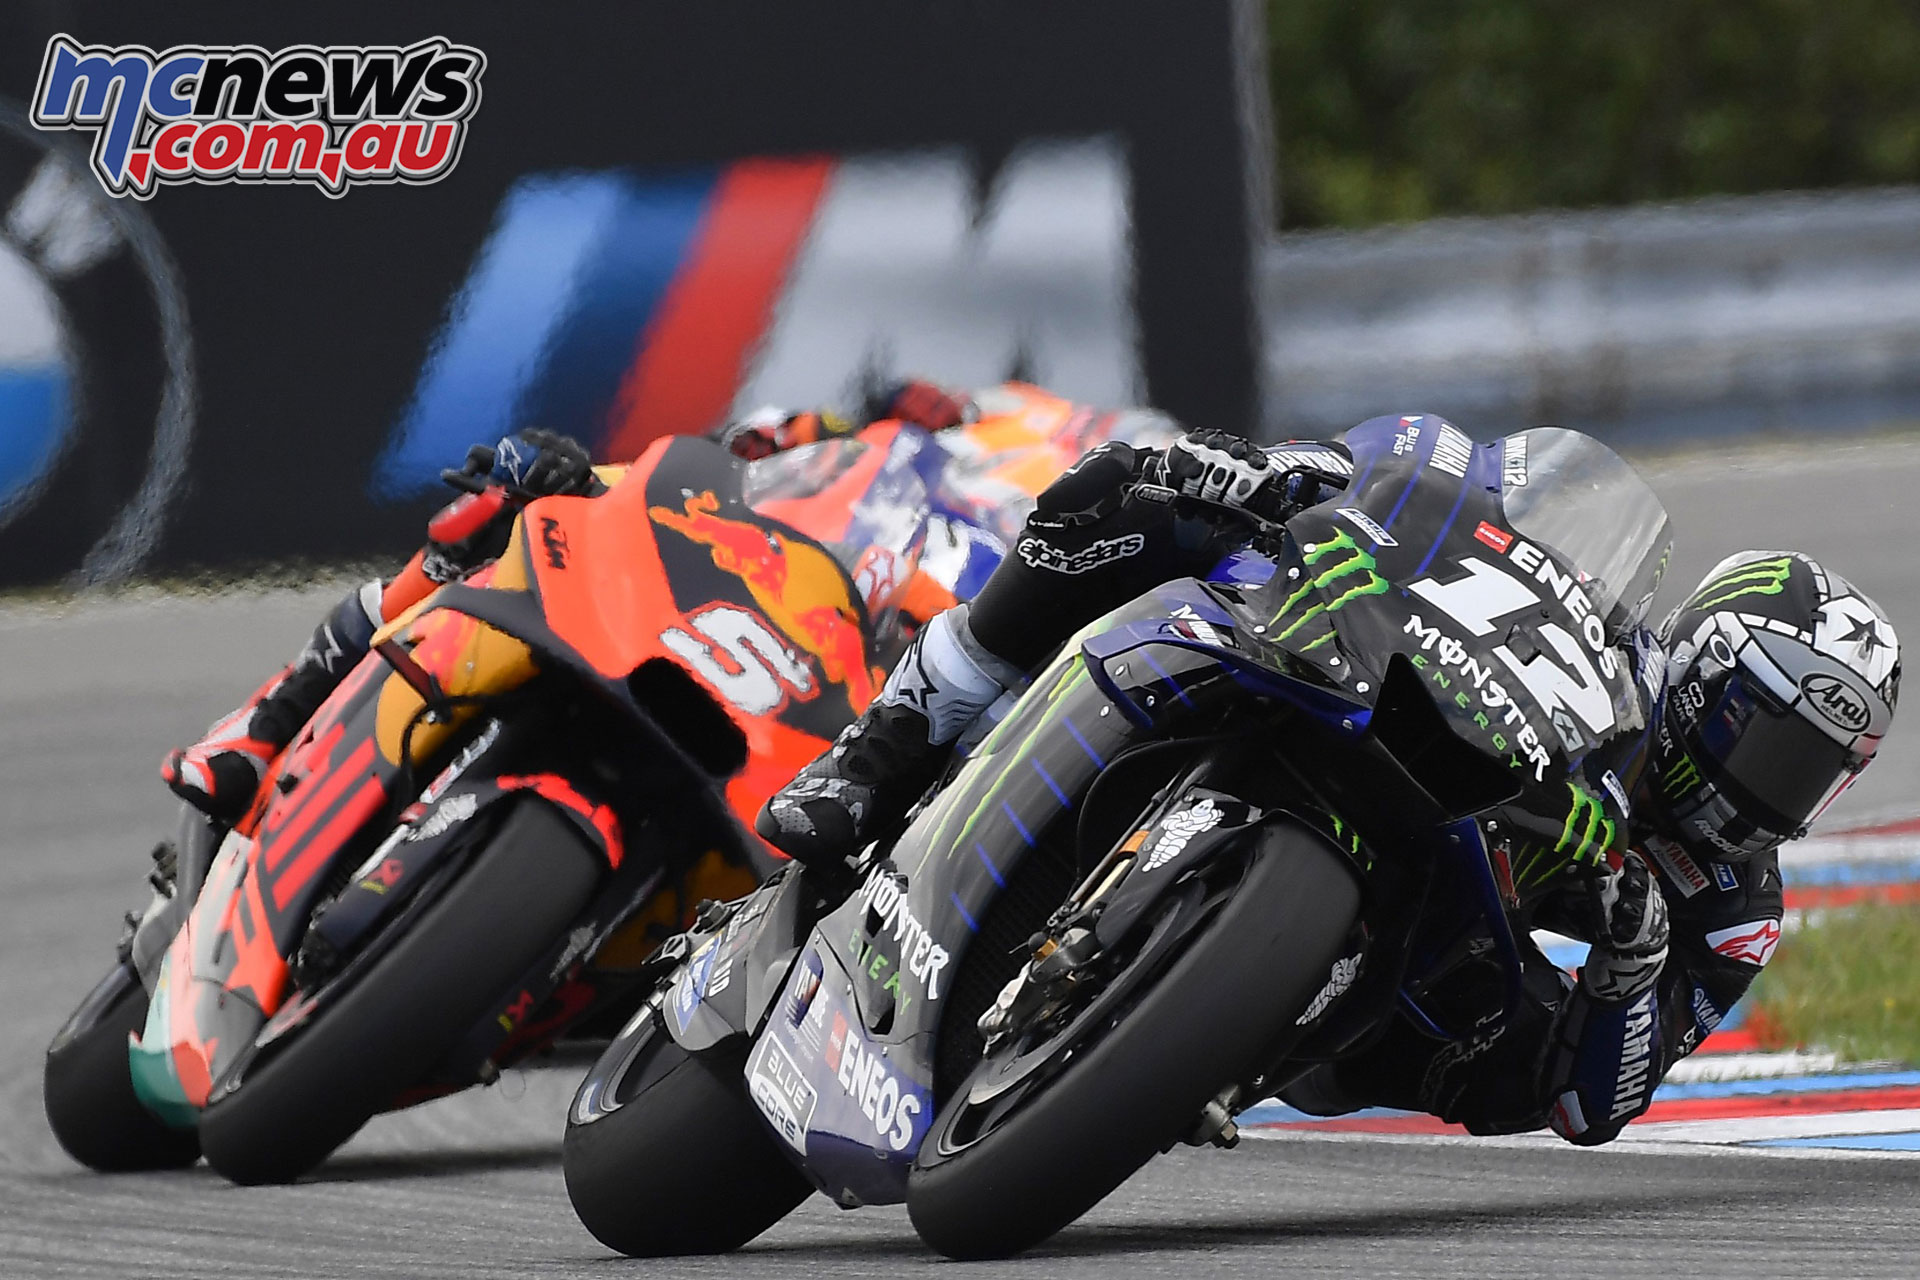 MotoGP Rnd Brno Maverick Vinales